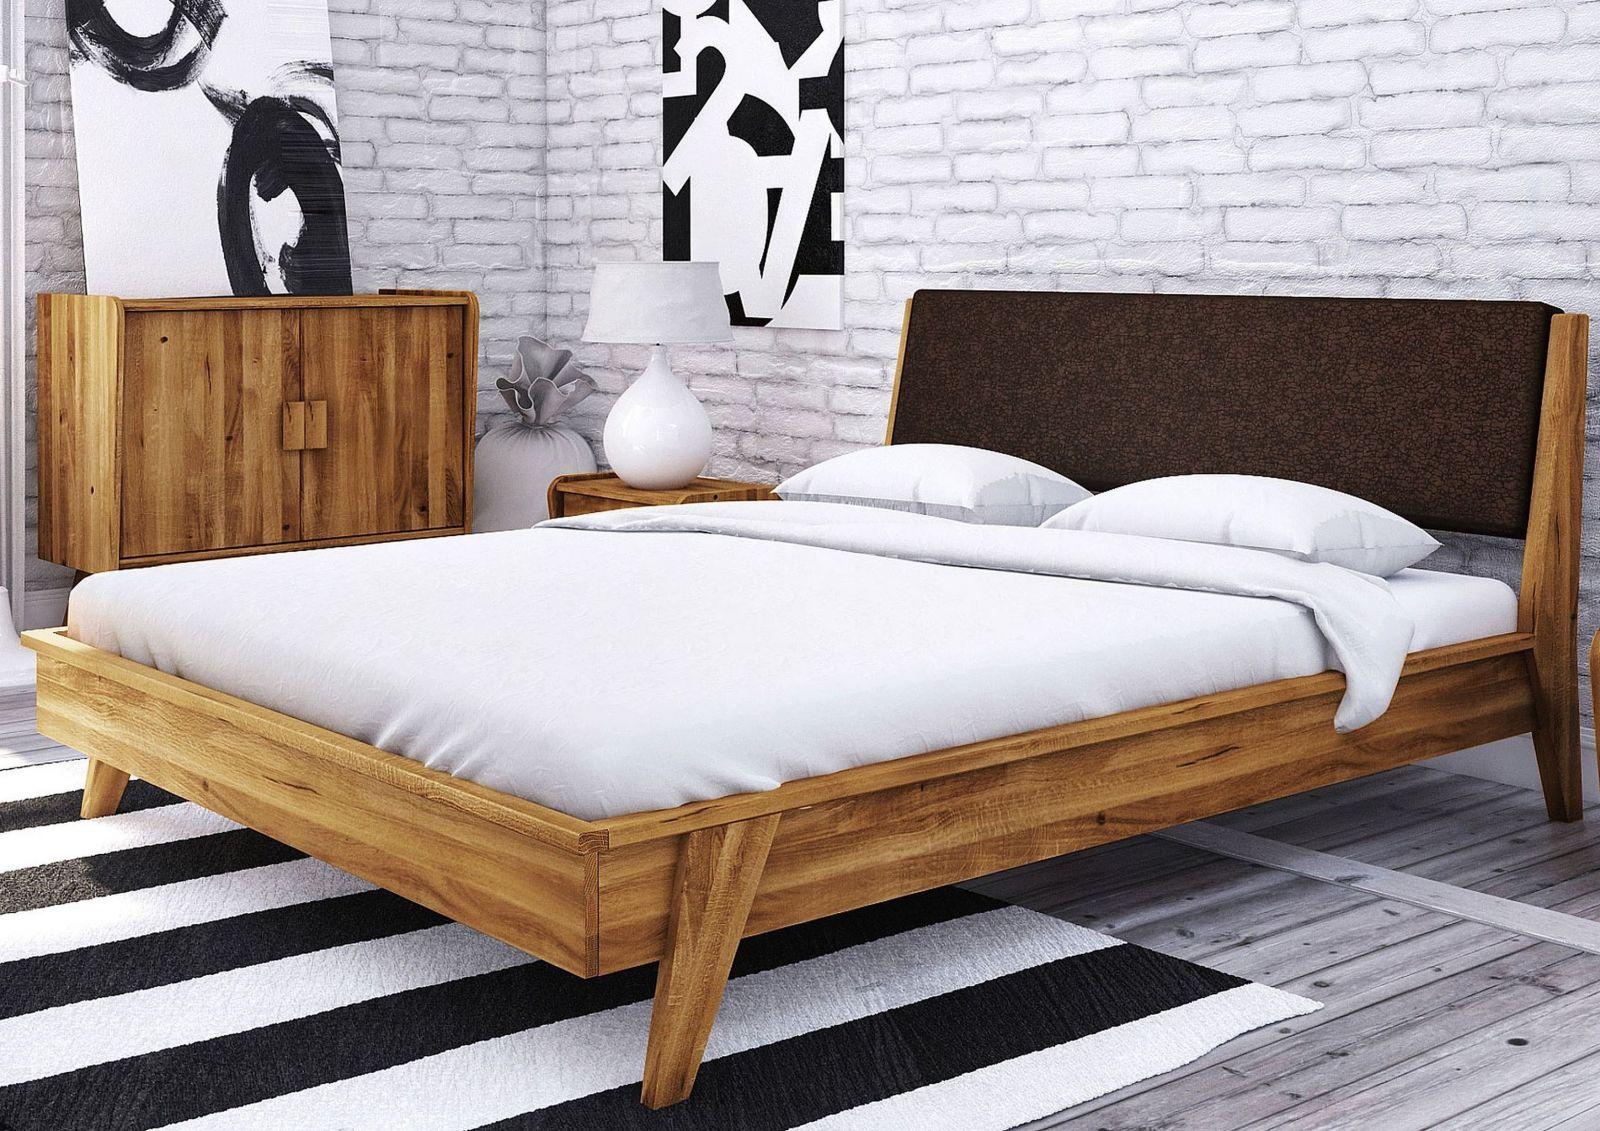 Full Size of 160x200 Bett Wildeiche Cm Braun Aus Massivholz Massivholzmbel 120x200 Betten Holz Kopfteil Dico 200x200 Günstig Kaufen Mit Schubladen Komplett Massiv 180x200 Bett 160x200 Bett